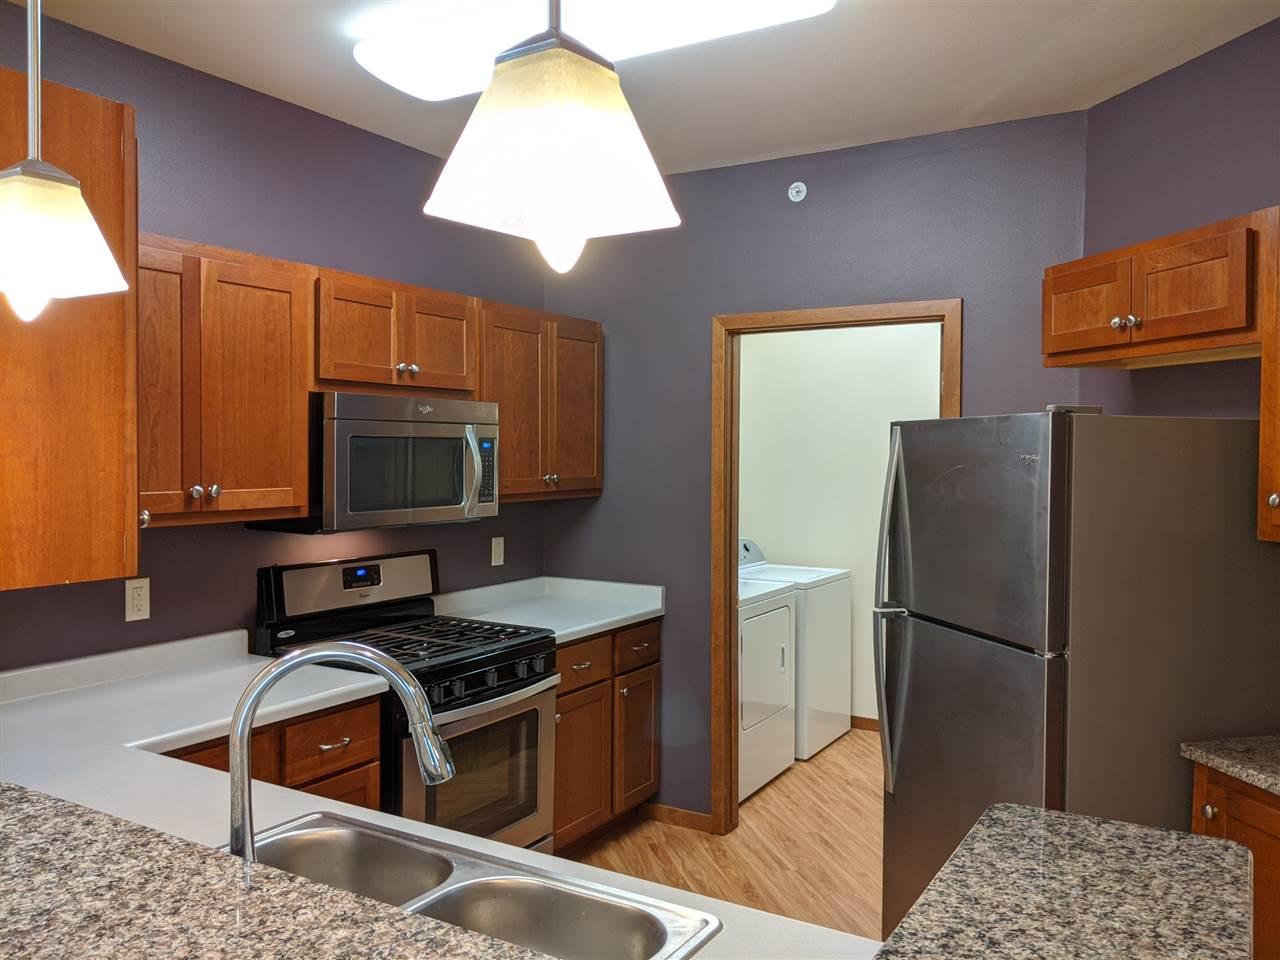 5194 Sassafras Dr, Fitchburg, Wisconsin 53711, 2 Bedrooms Bedrooms, ,Rental,For Rent,Sassafras Dr,1893625